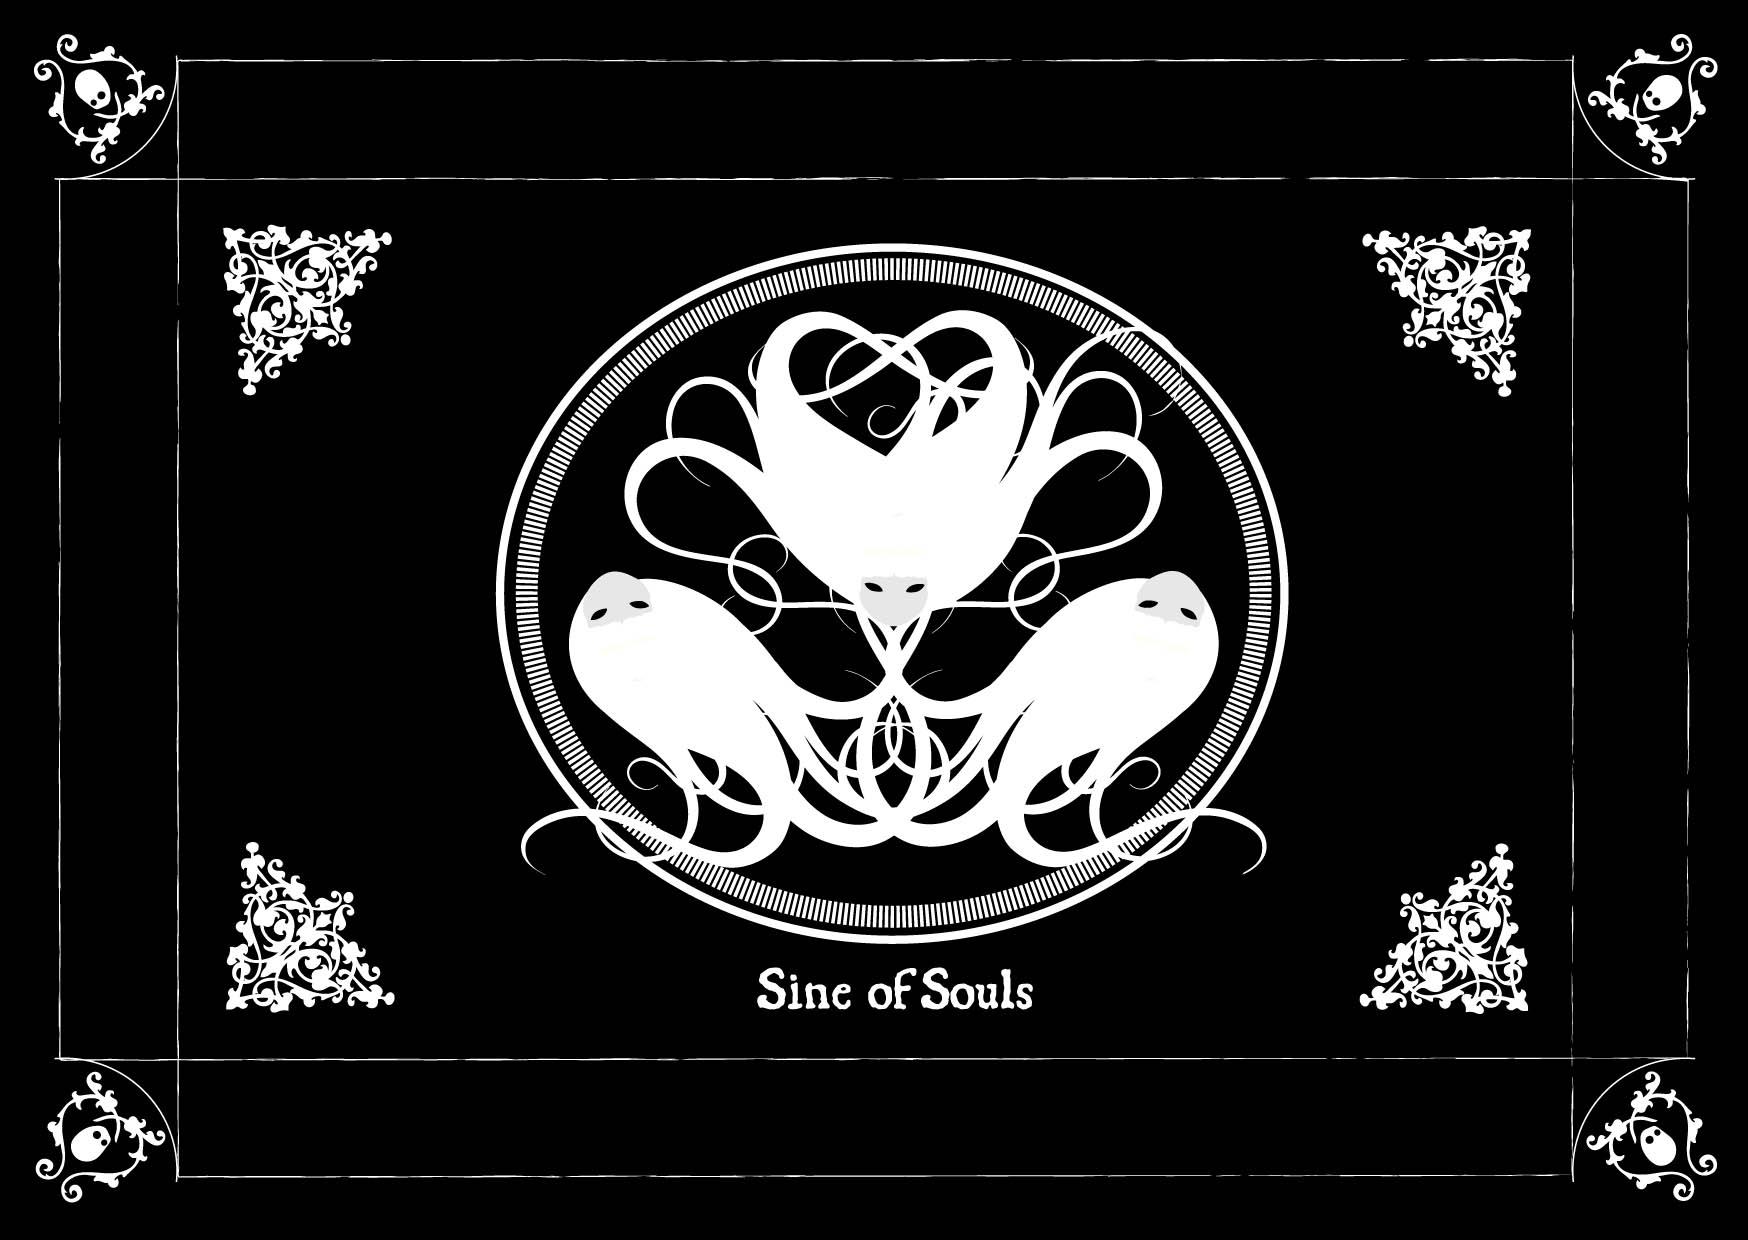 Sine of Souls_0000_Layer 1.jpg